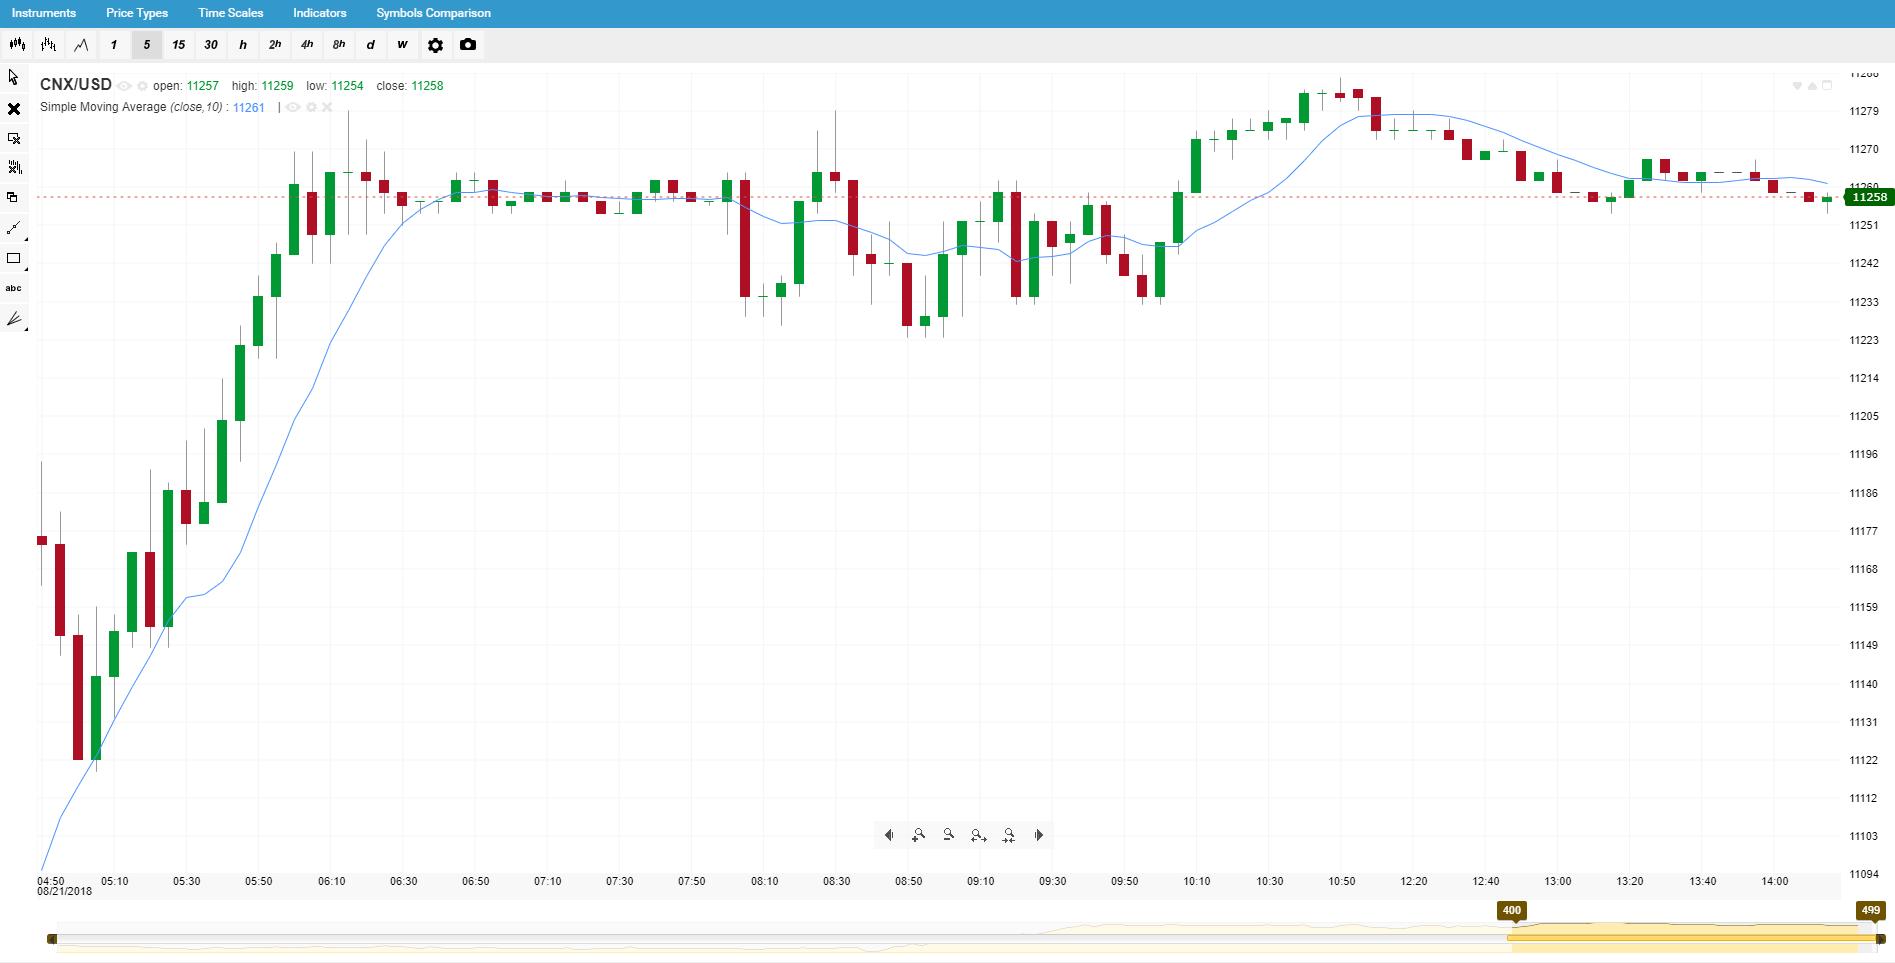 Корелирани борсови индекси - CNX/USD